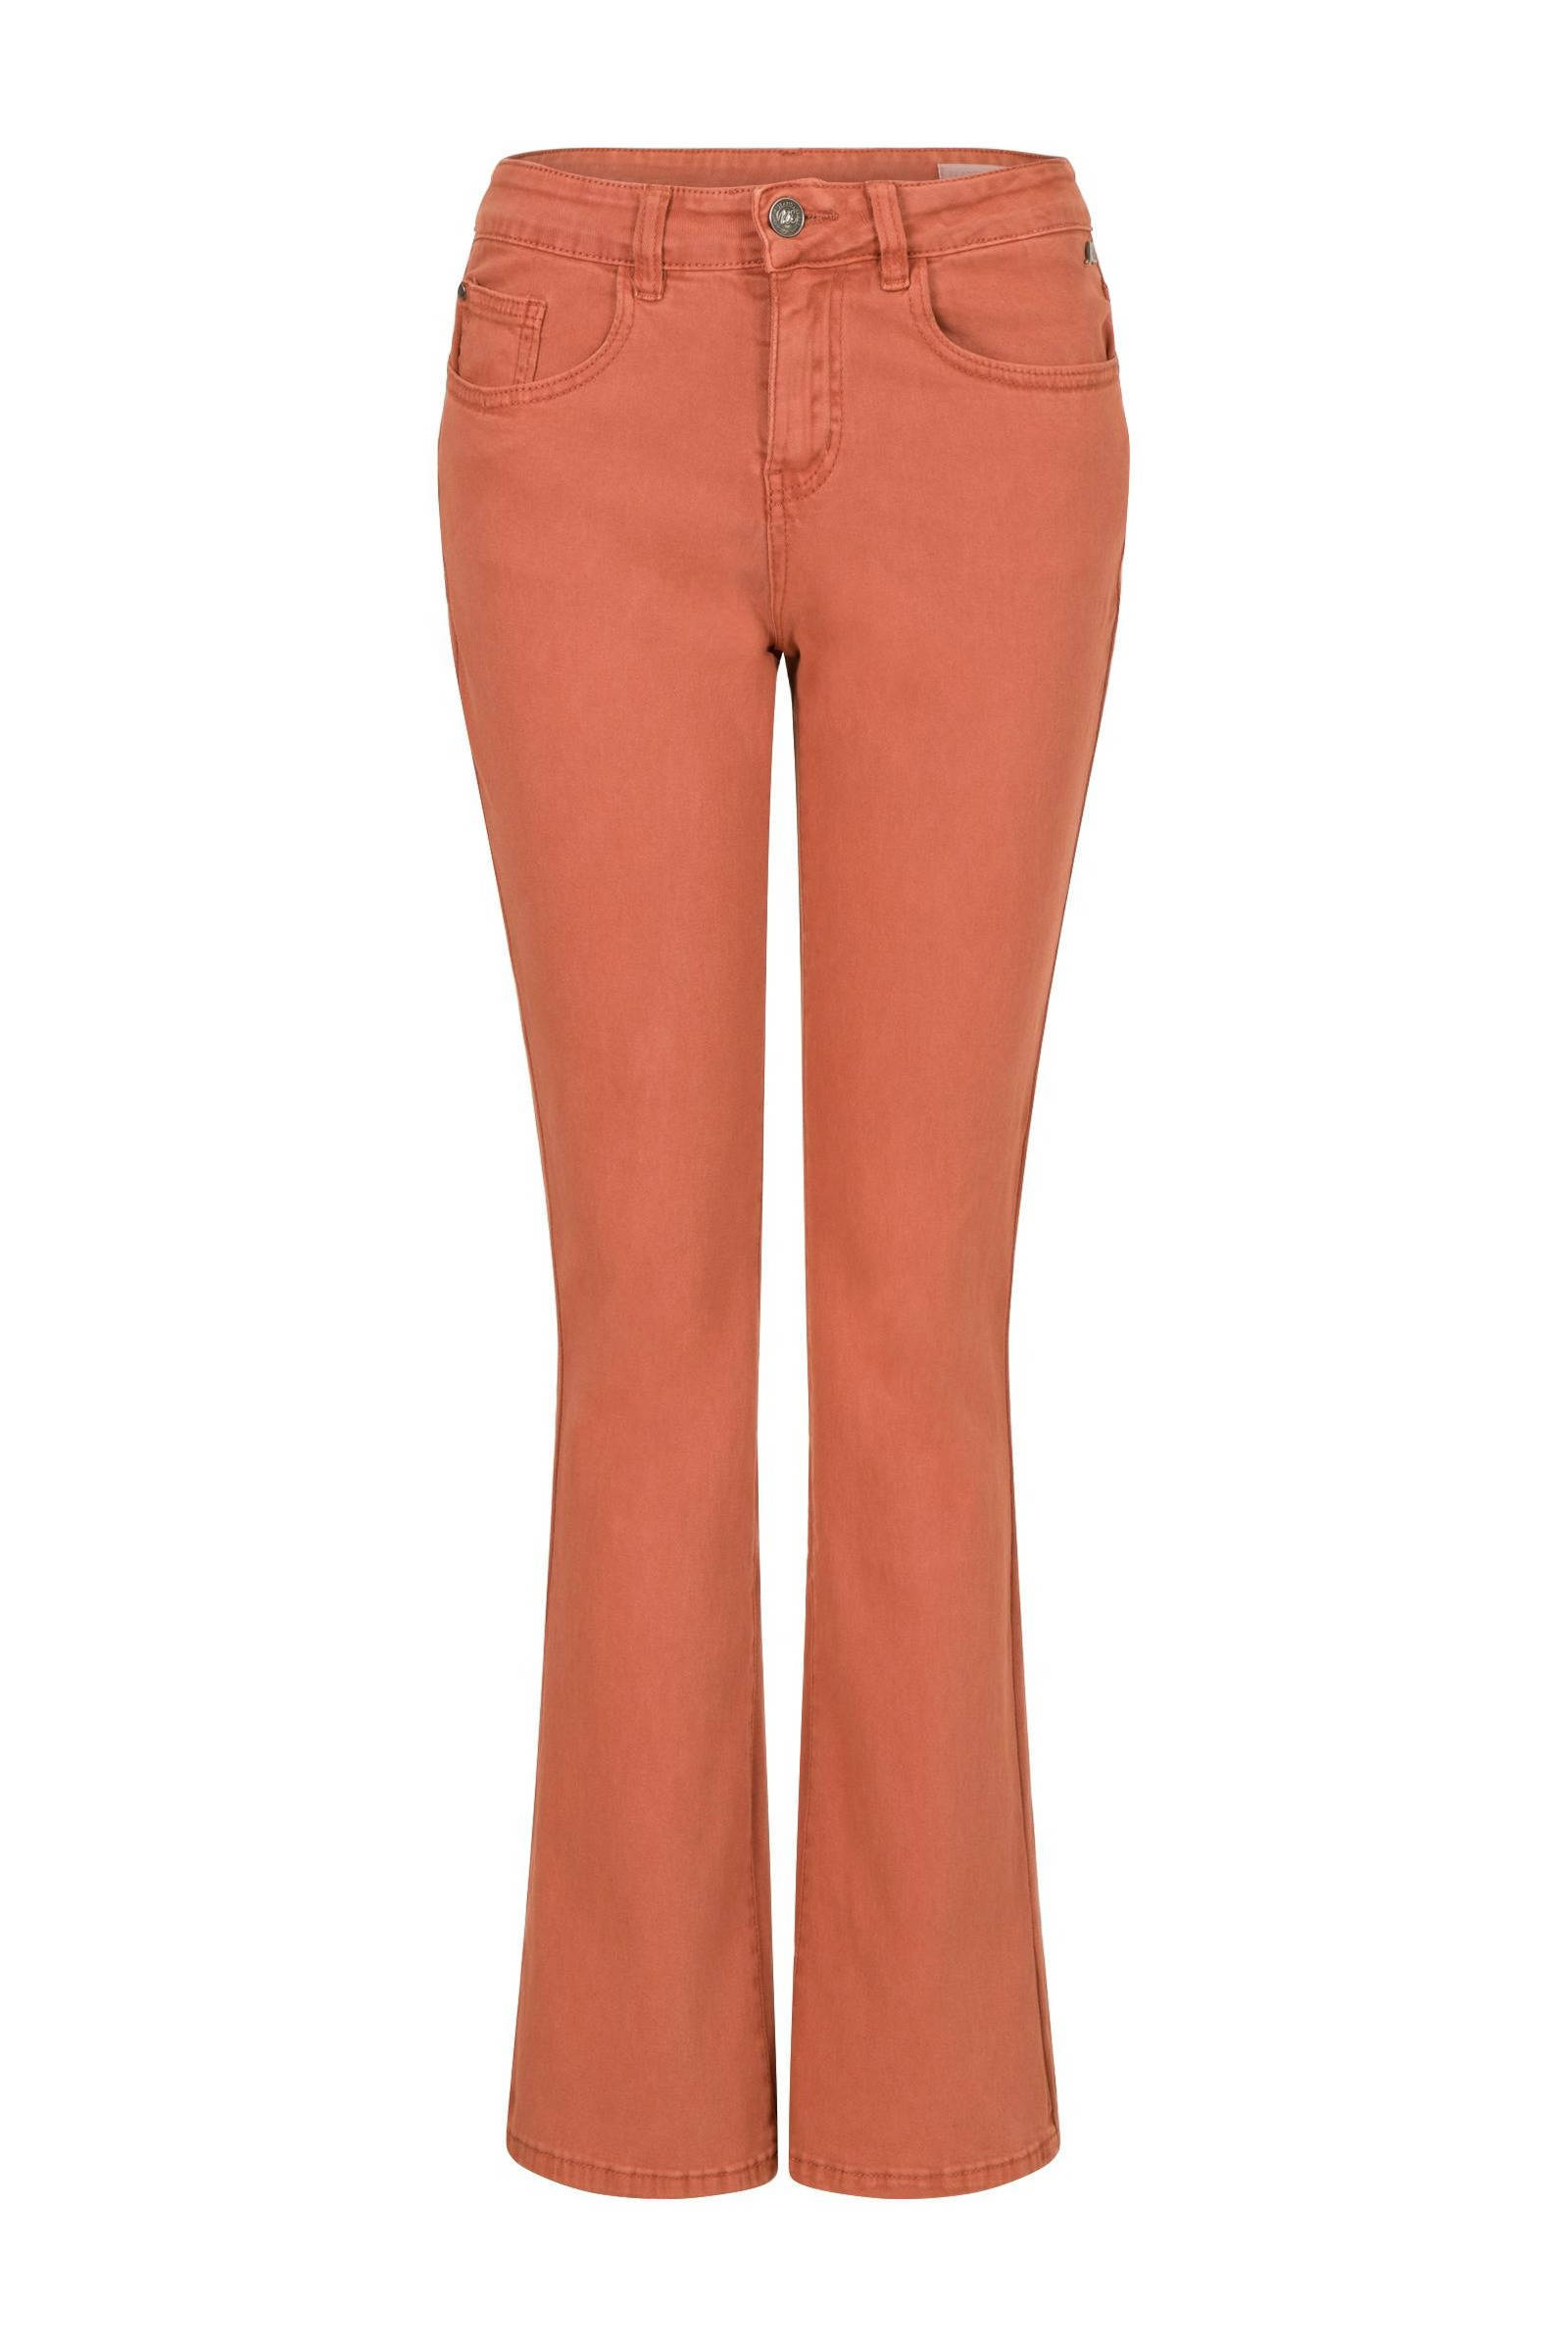 Miss Etam dames flared jeans bij wehkamp Gratis bezorging